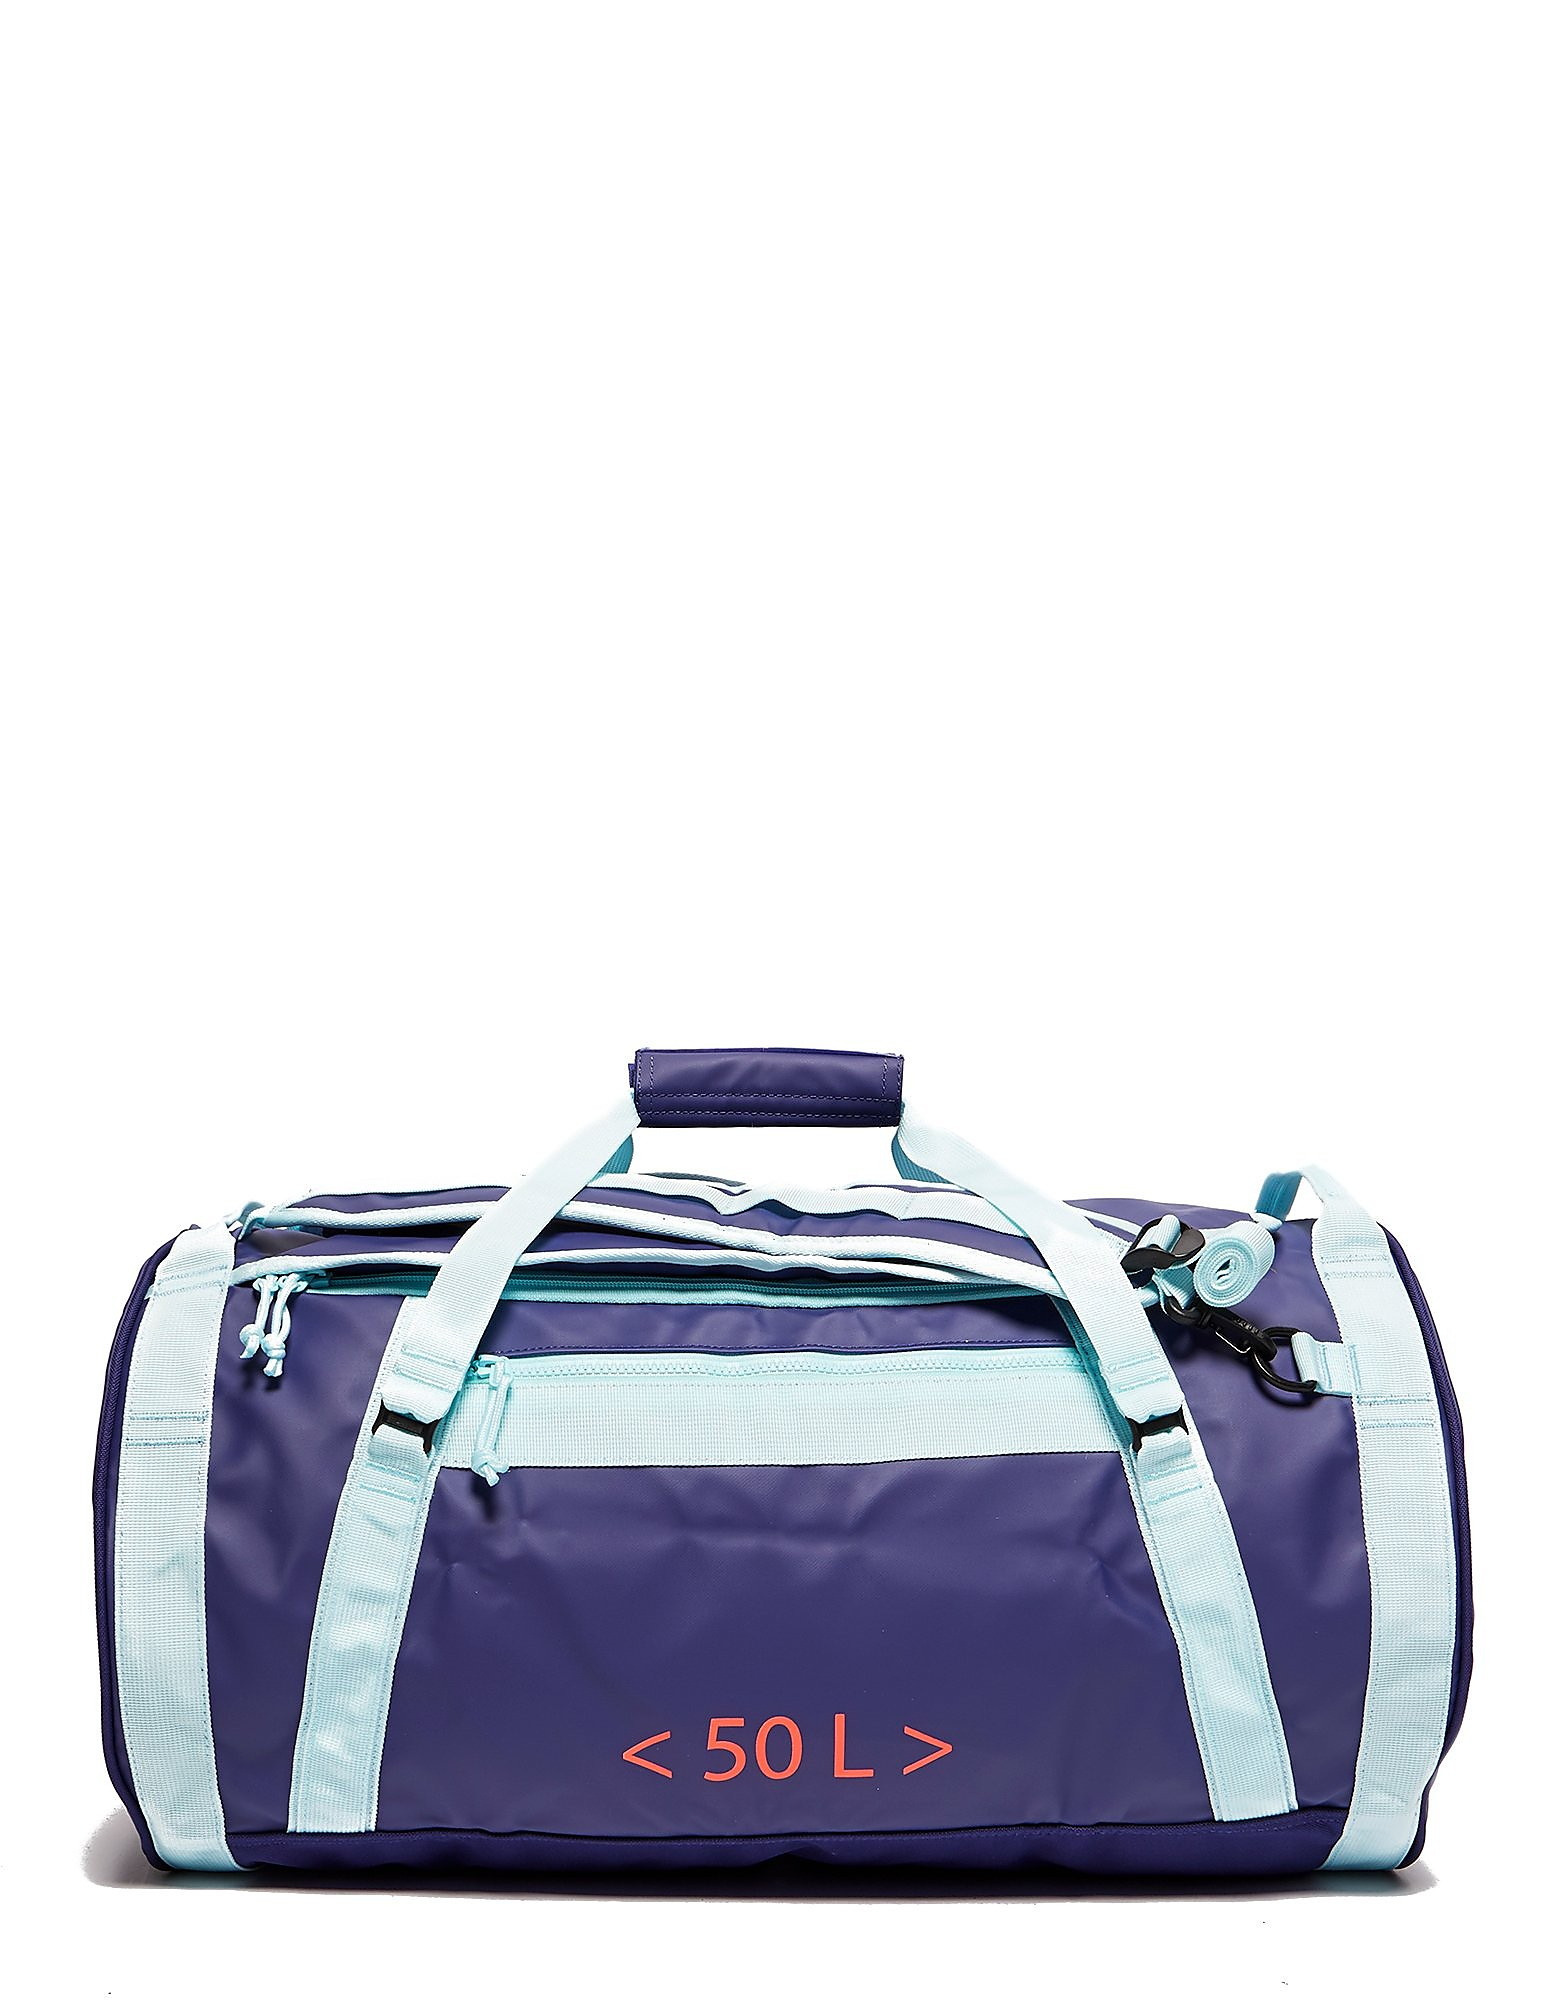 Helly Hansen 50L Duffel Bag 2